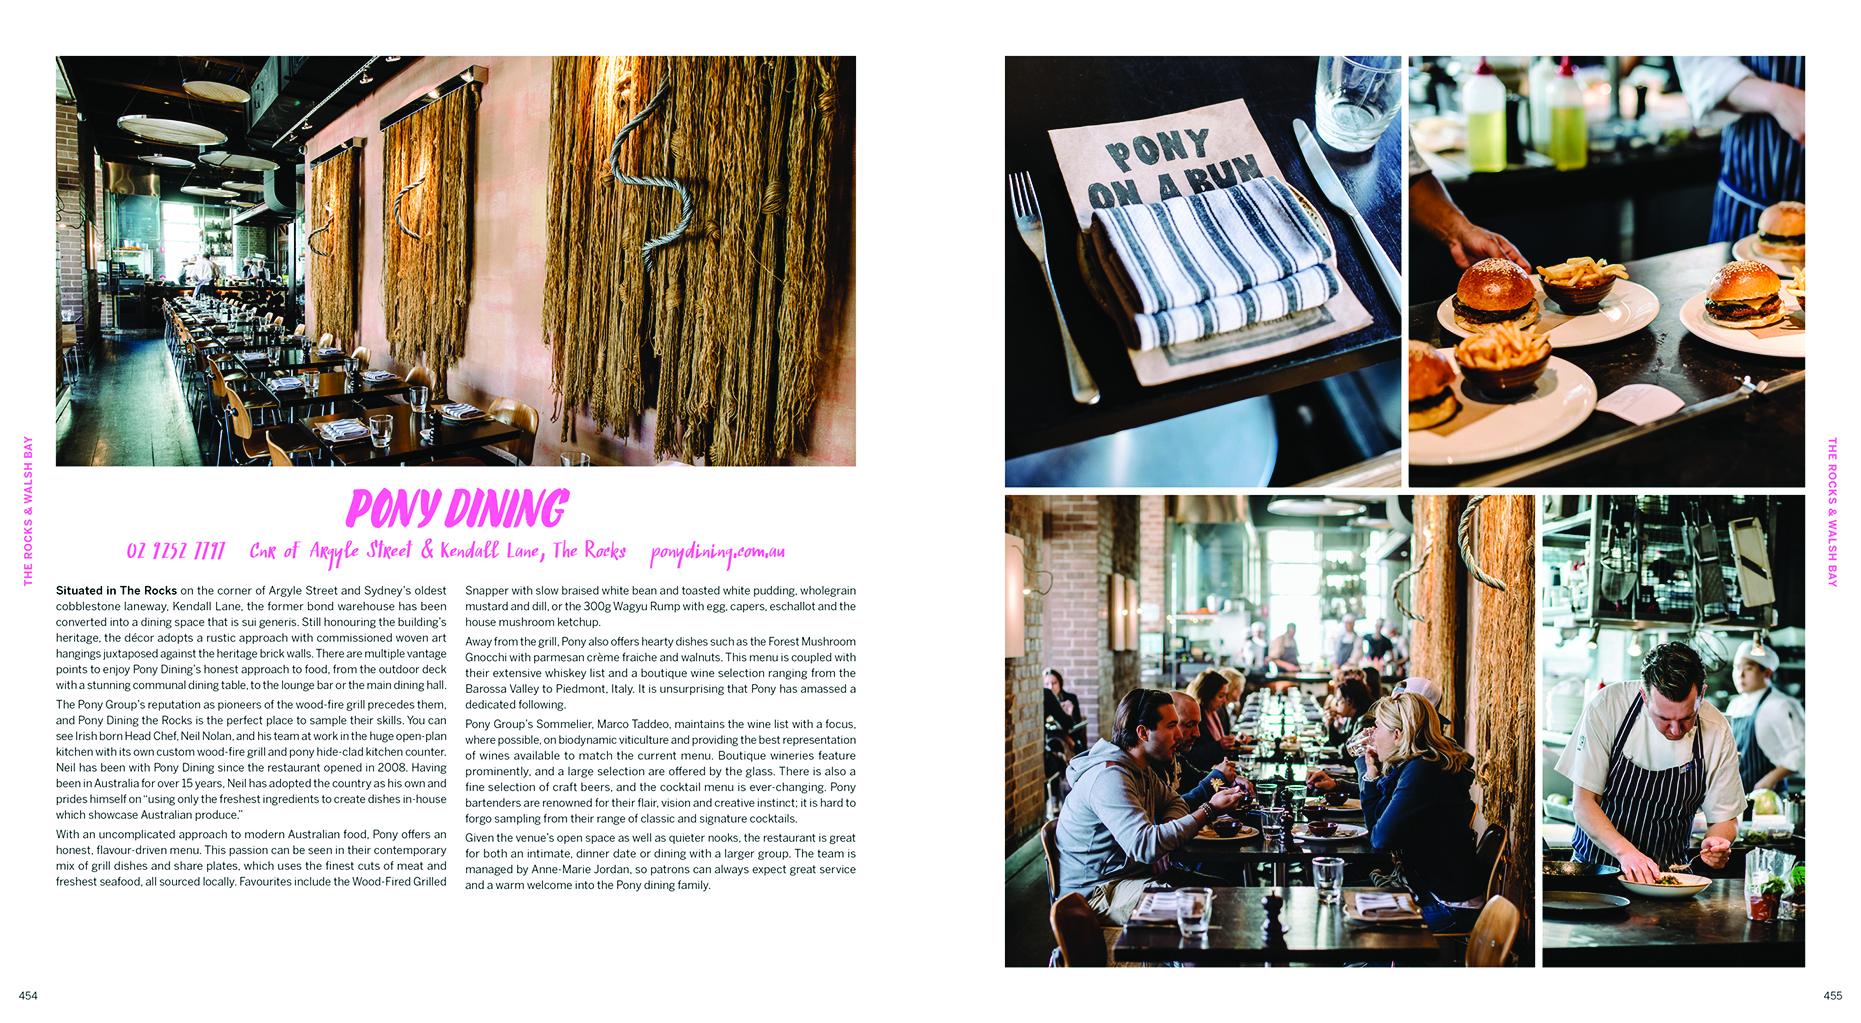 Flavours-of-Sydney-pg454.jpg